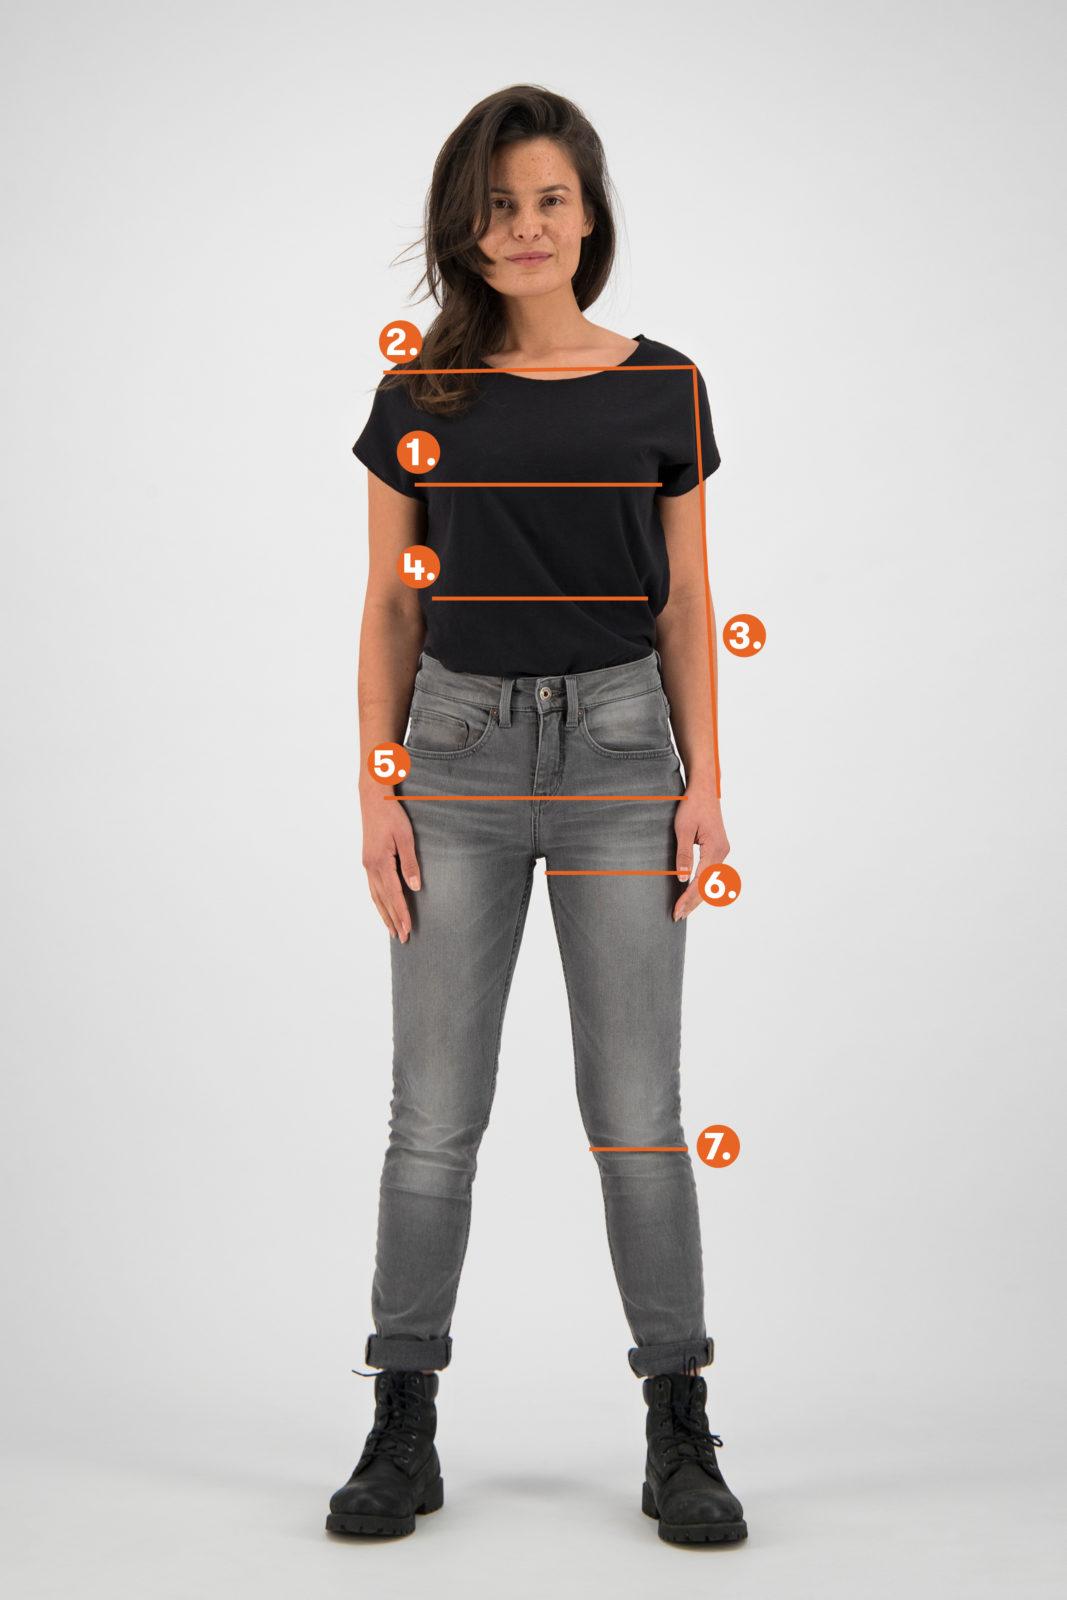 Kuyichi size Women Where to measure